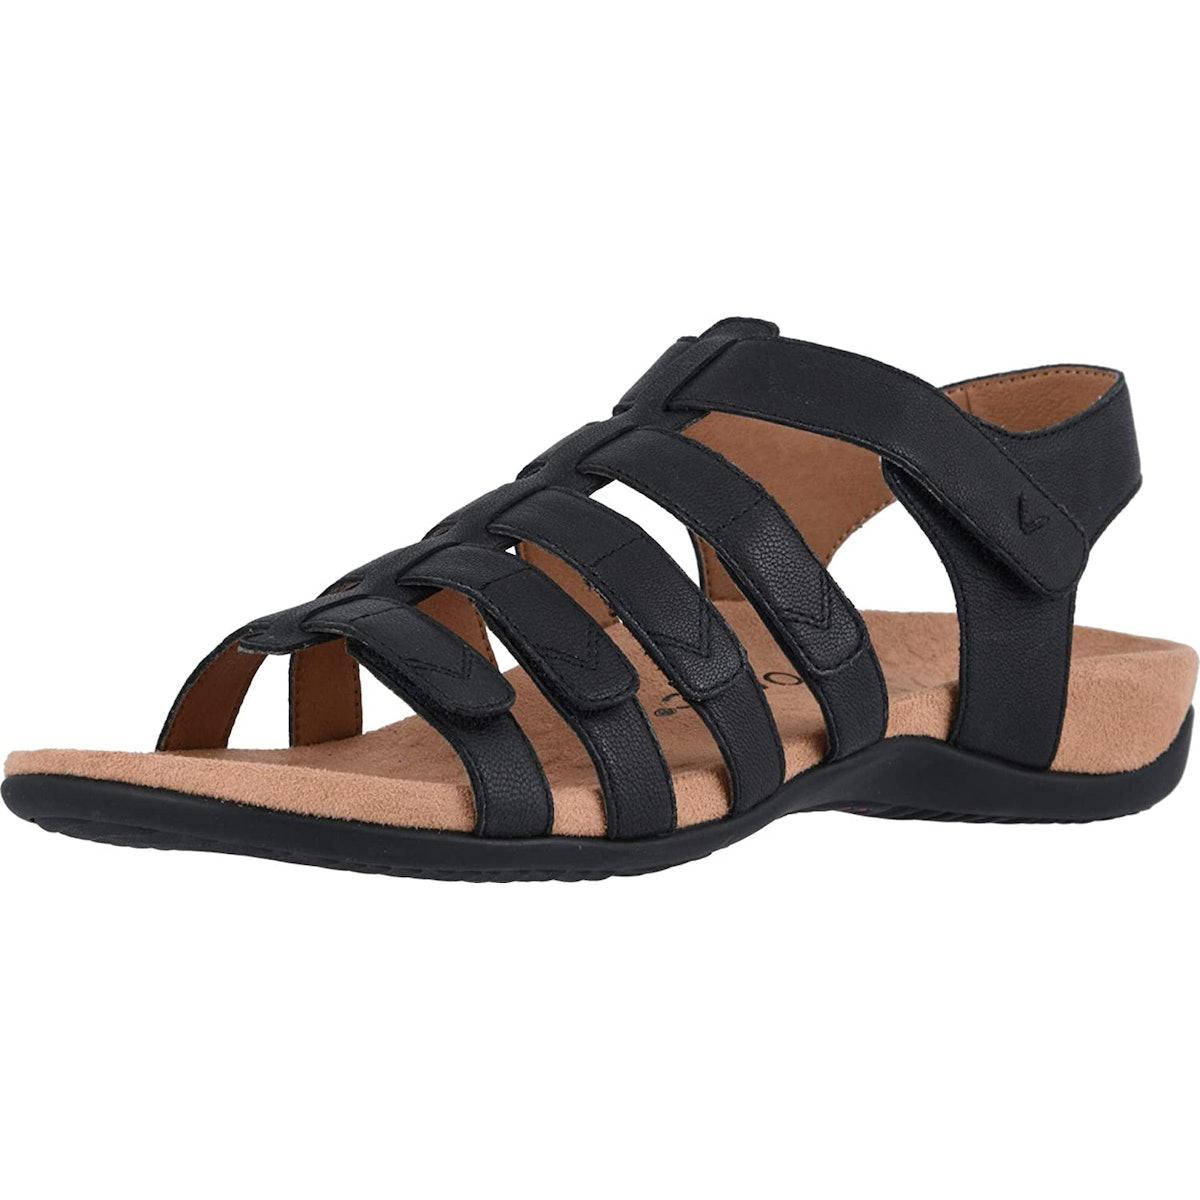 Vionic Harissa Gladiator Walking Sandals